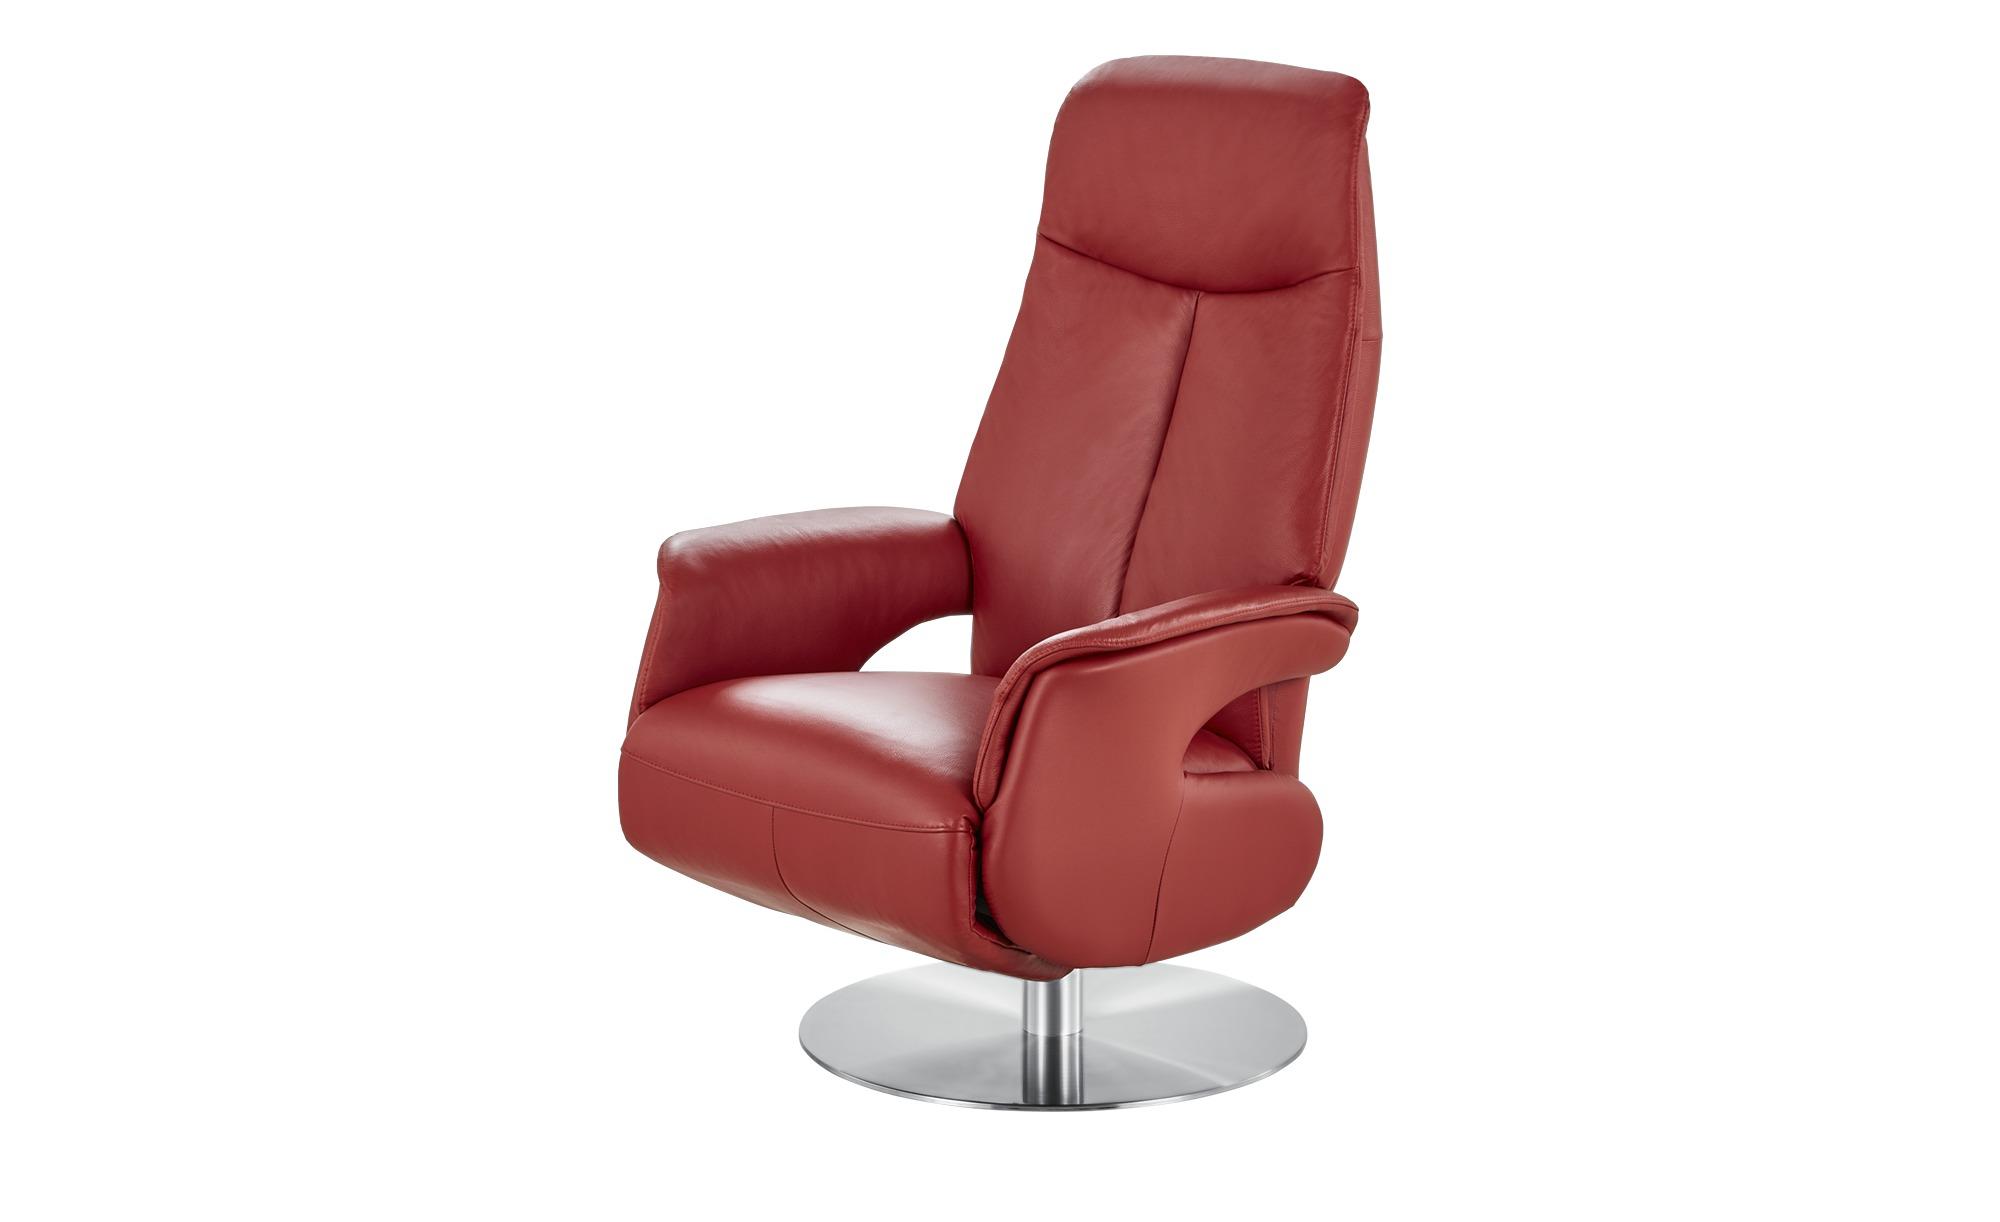 Relaxsessel  Nils ¦ rot ¦ Maße (cm): B: 70 H: 111 T: 79 Polstermöbel > Sessel > Fernsehsessel - Höffner